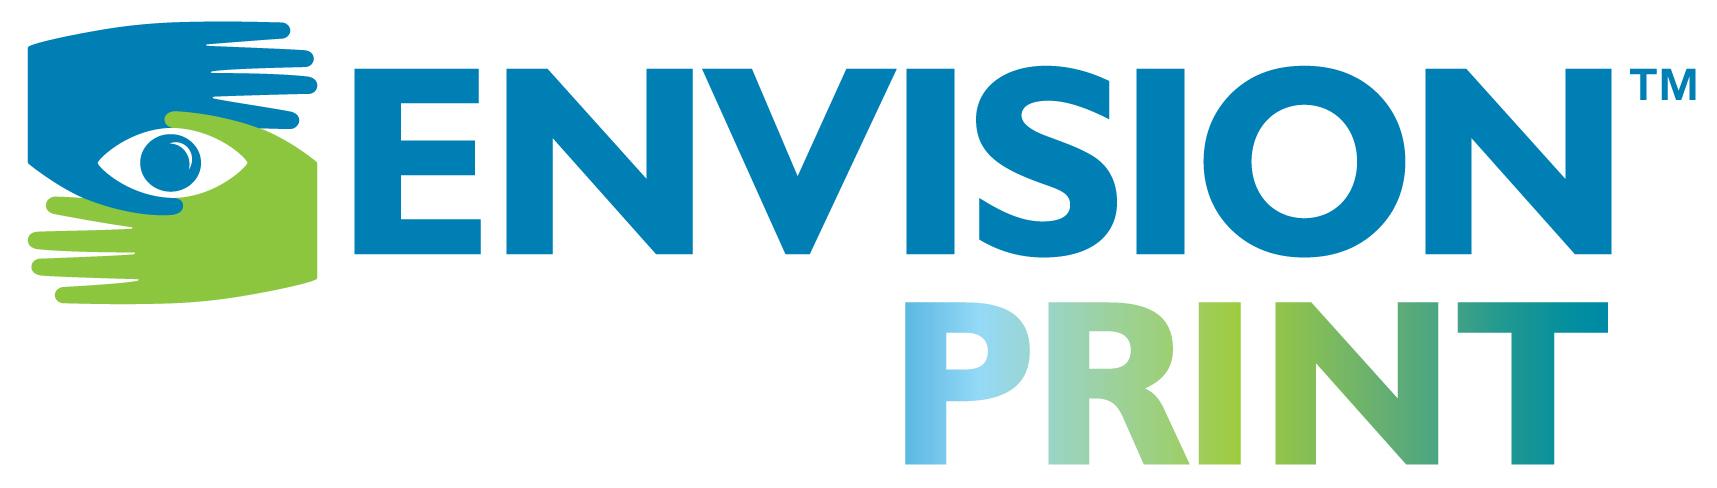 Envision Print logo